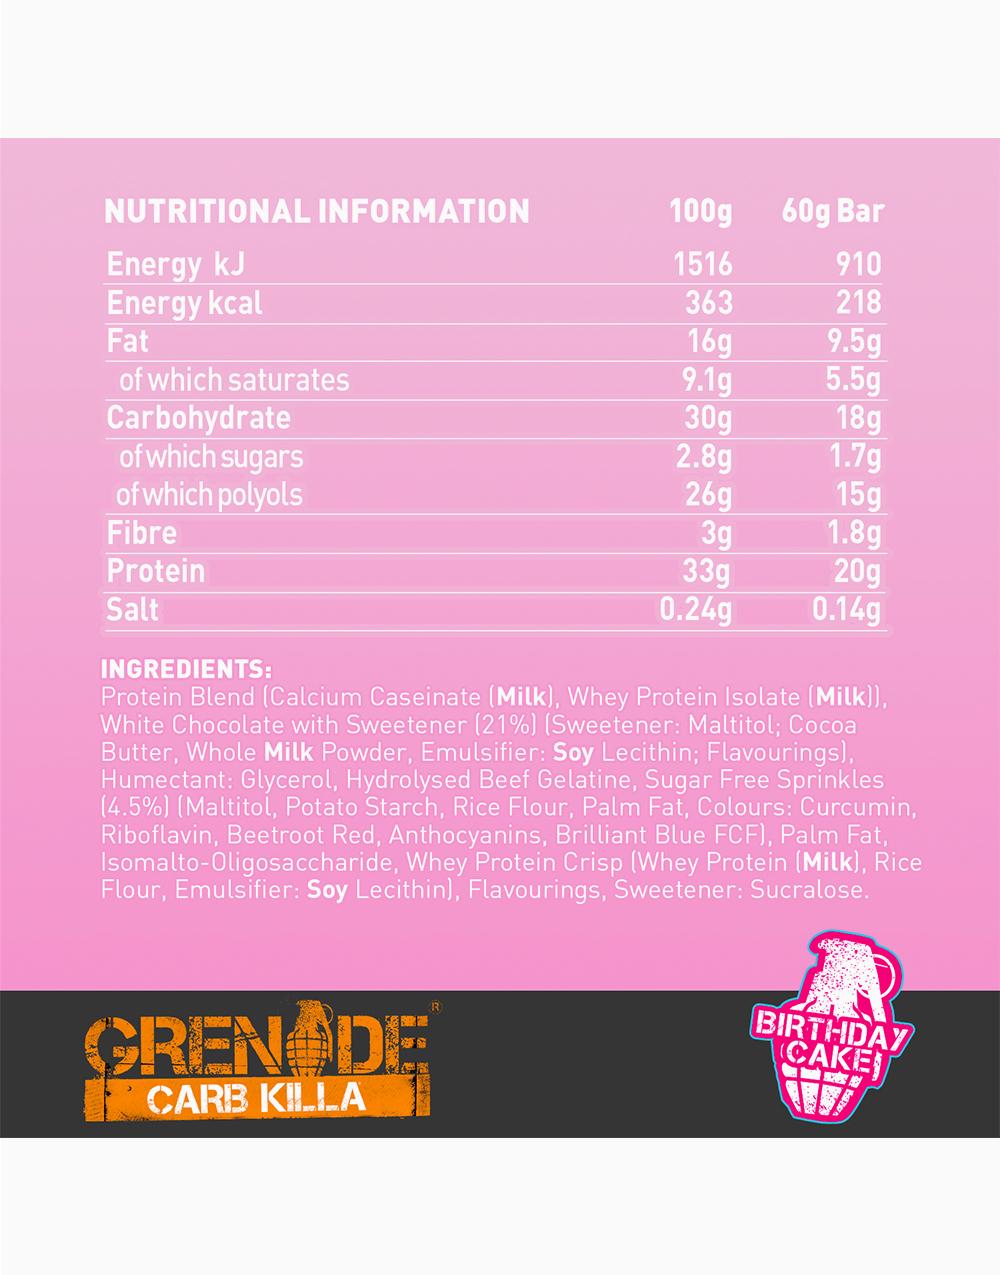 Carb Killa Protein Bar in Birthday Cake by Grenade